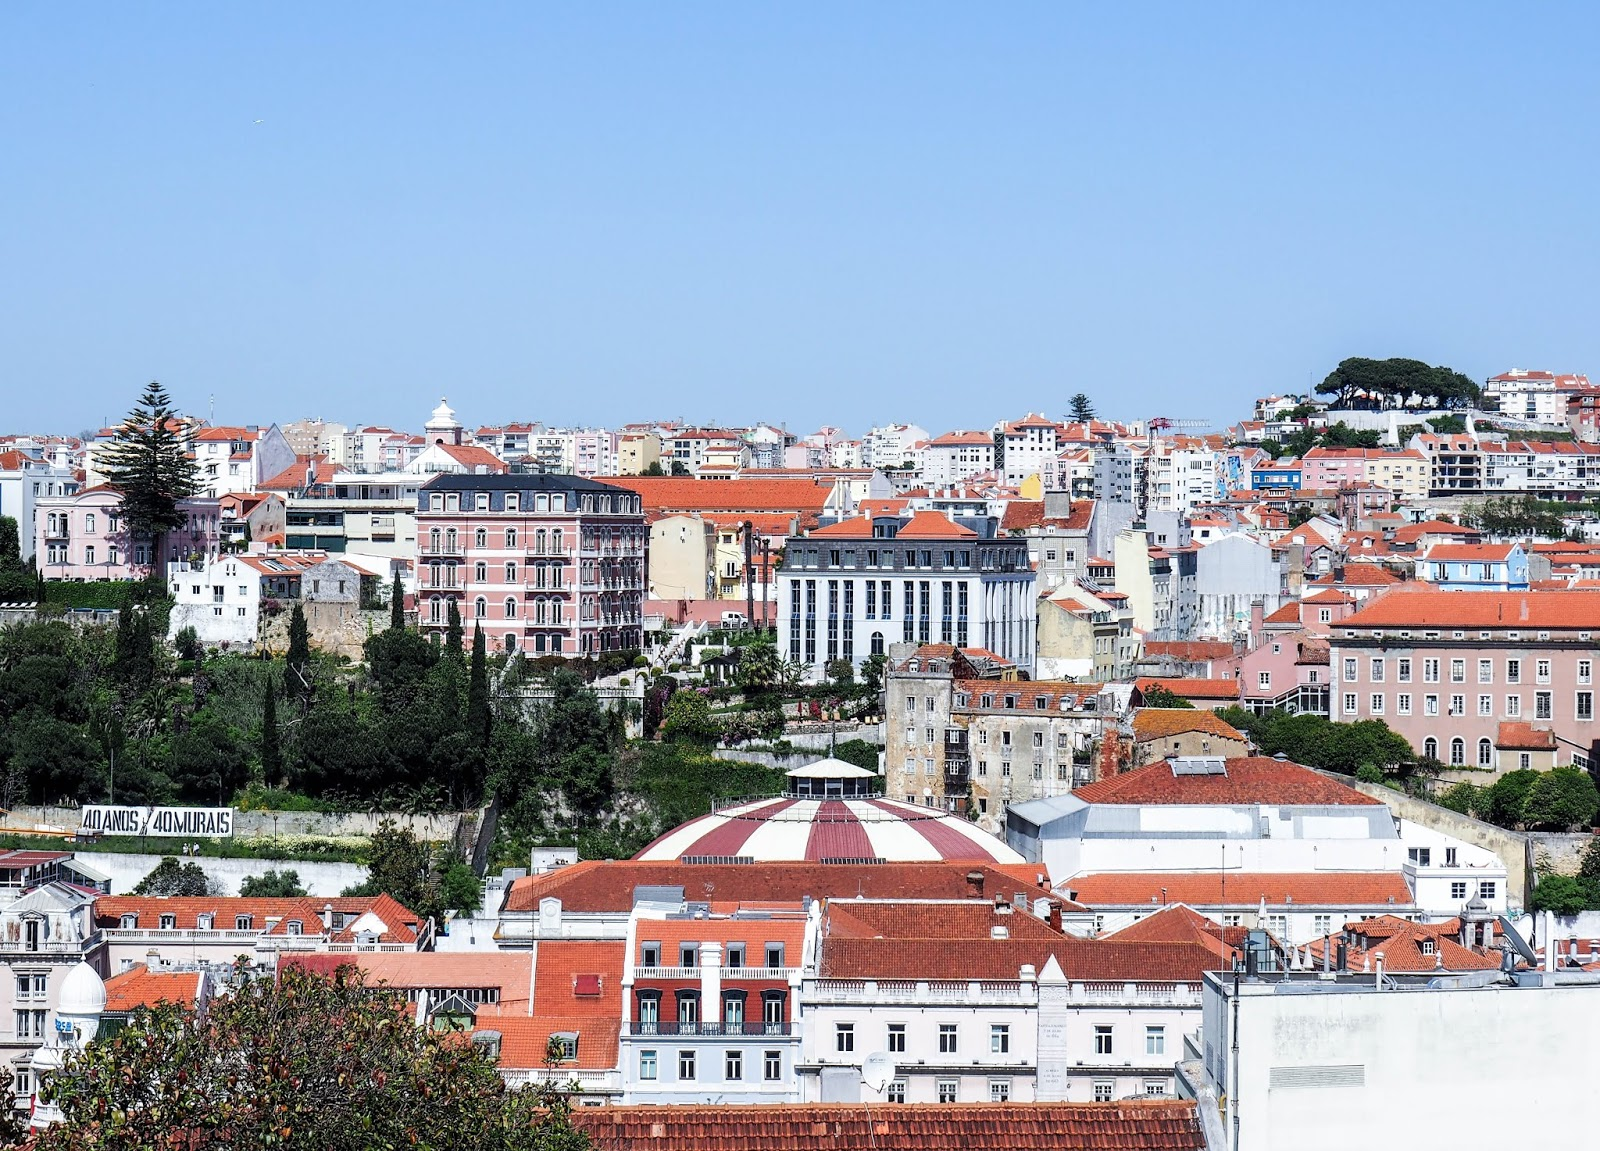 Lissabon, Lisbon, Portugal, matkailu, travel